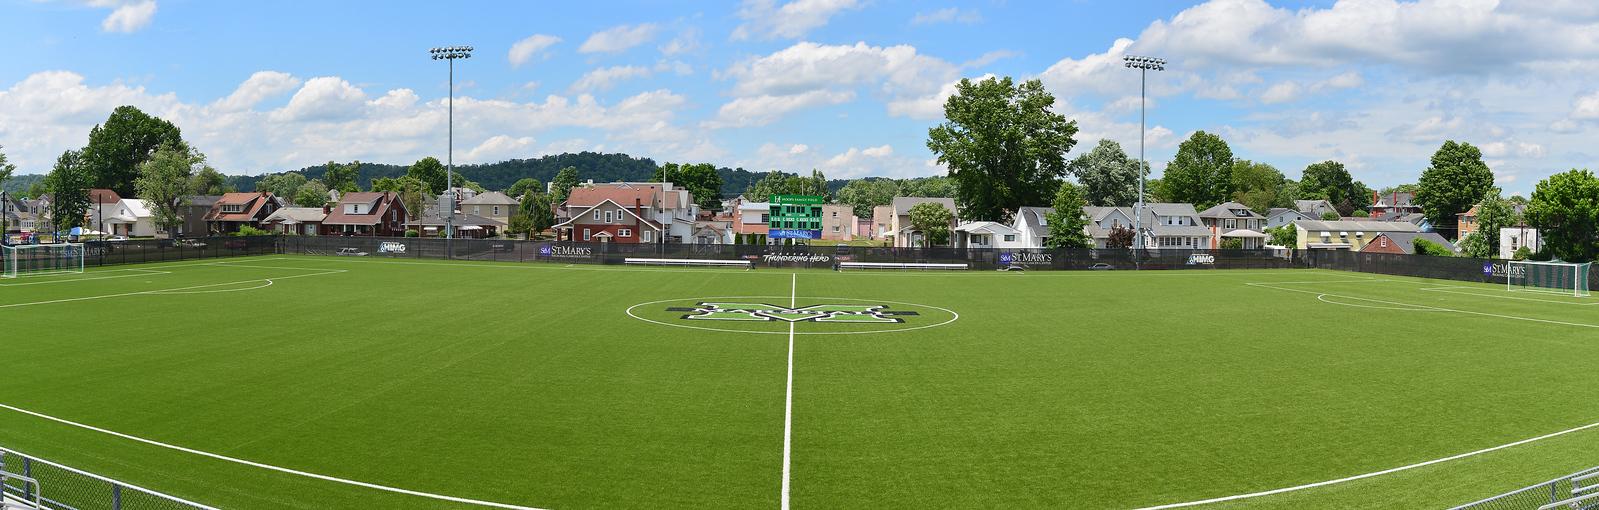 soccer Panorama2